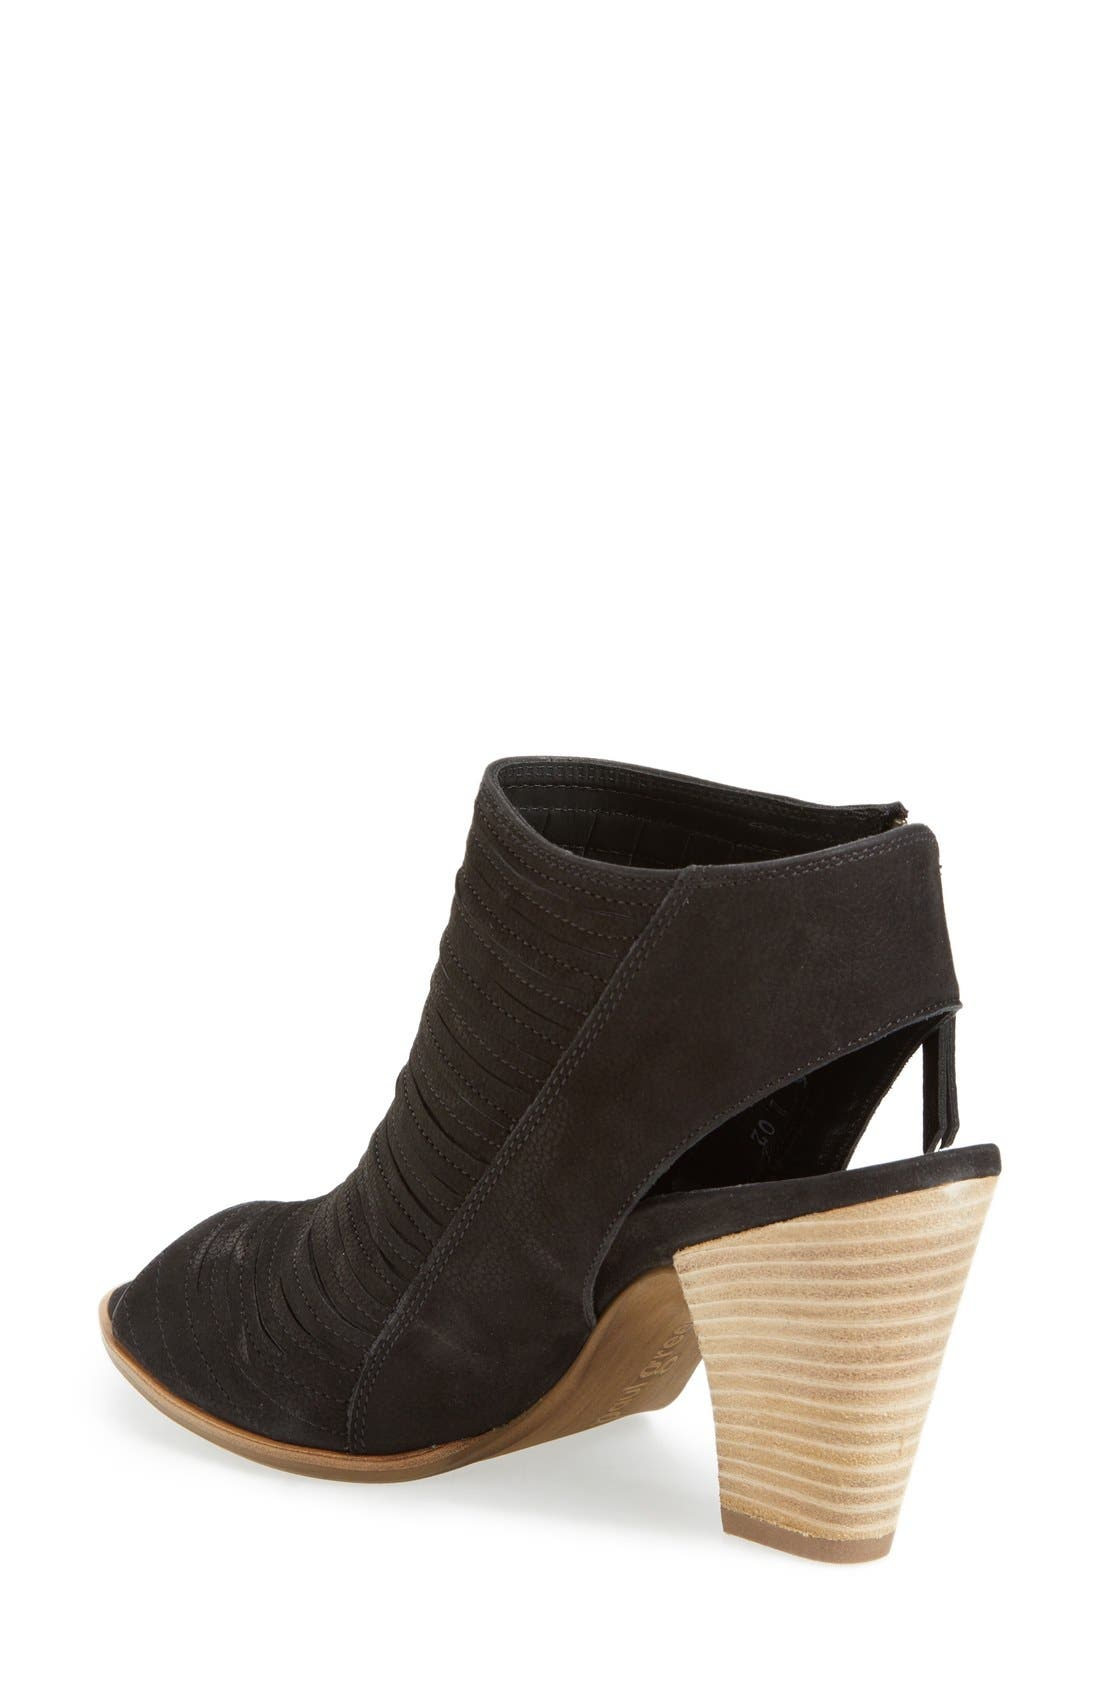 'Cayanne' Leather Peep Toe Sandal,                             Alternate thumbnail 33, color,